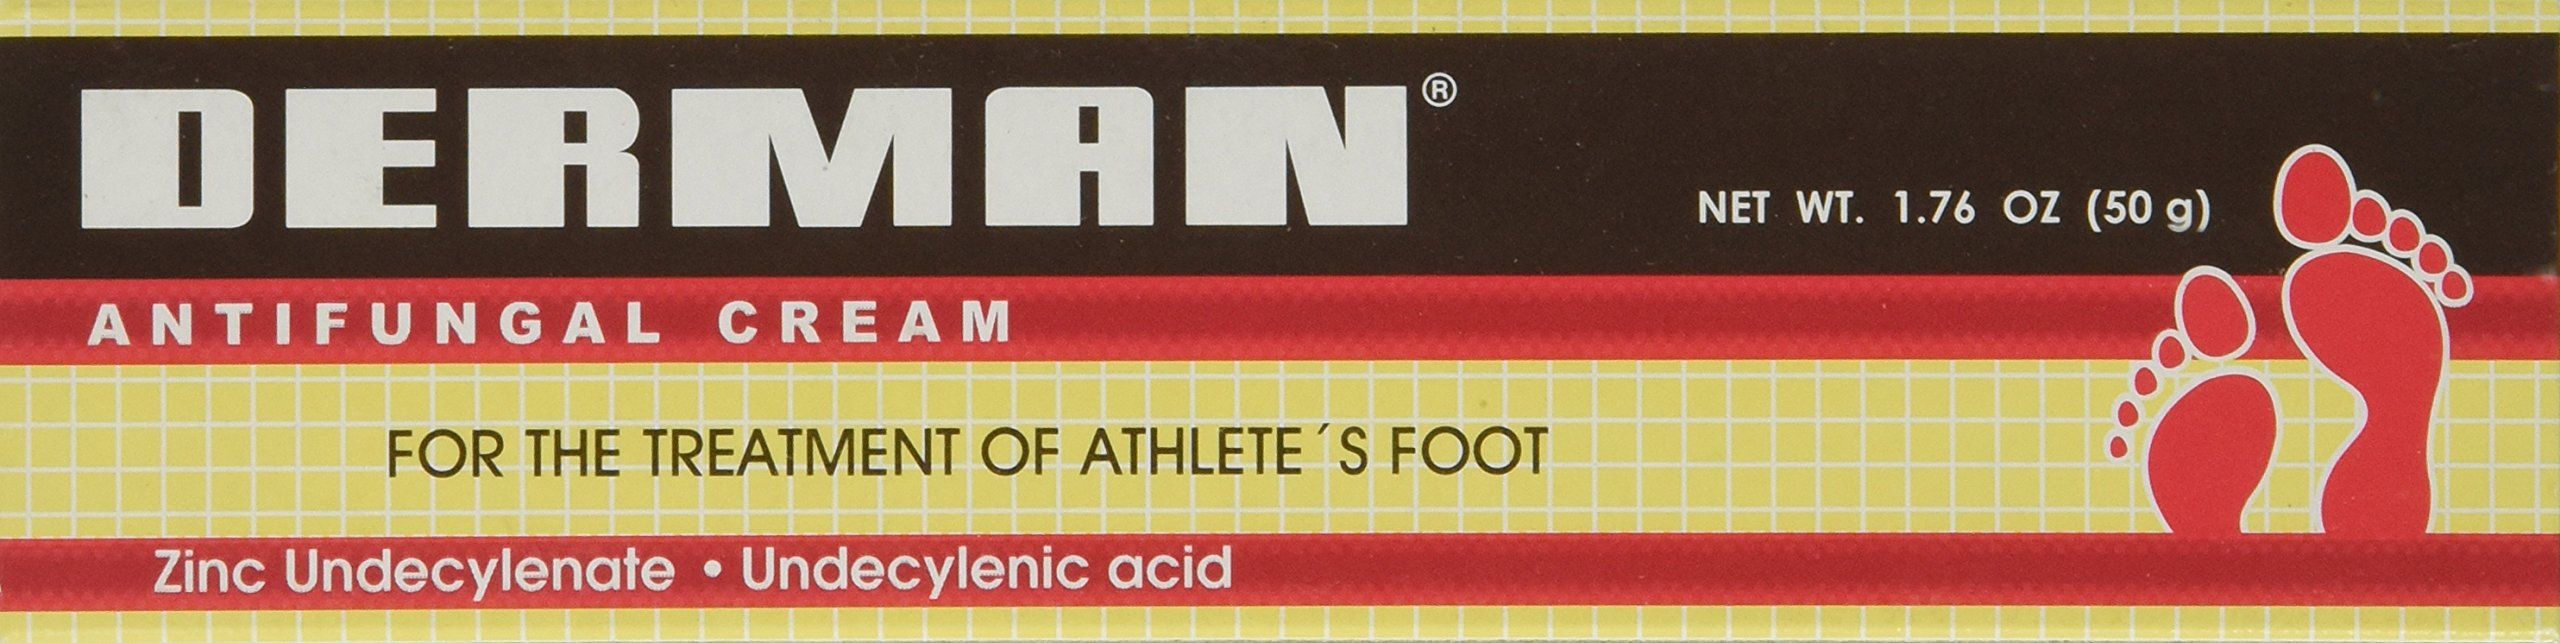 derman foot cream